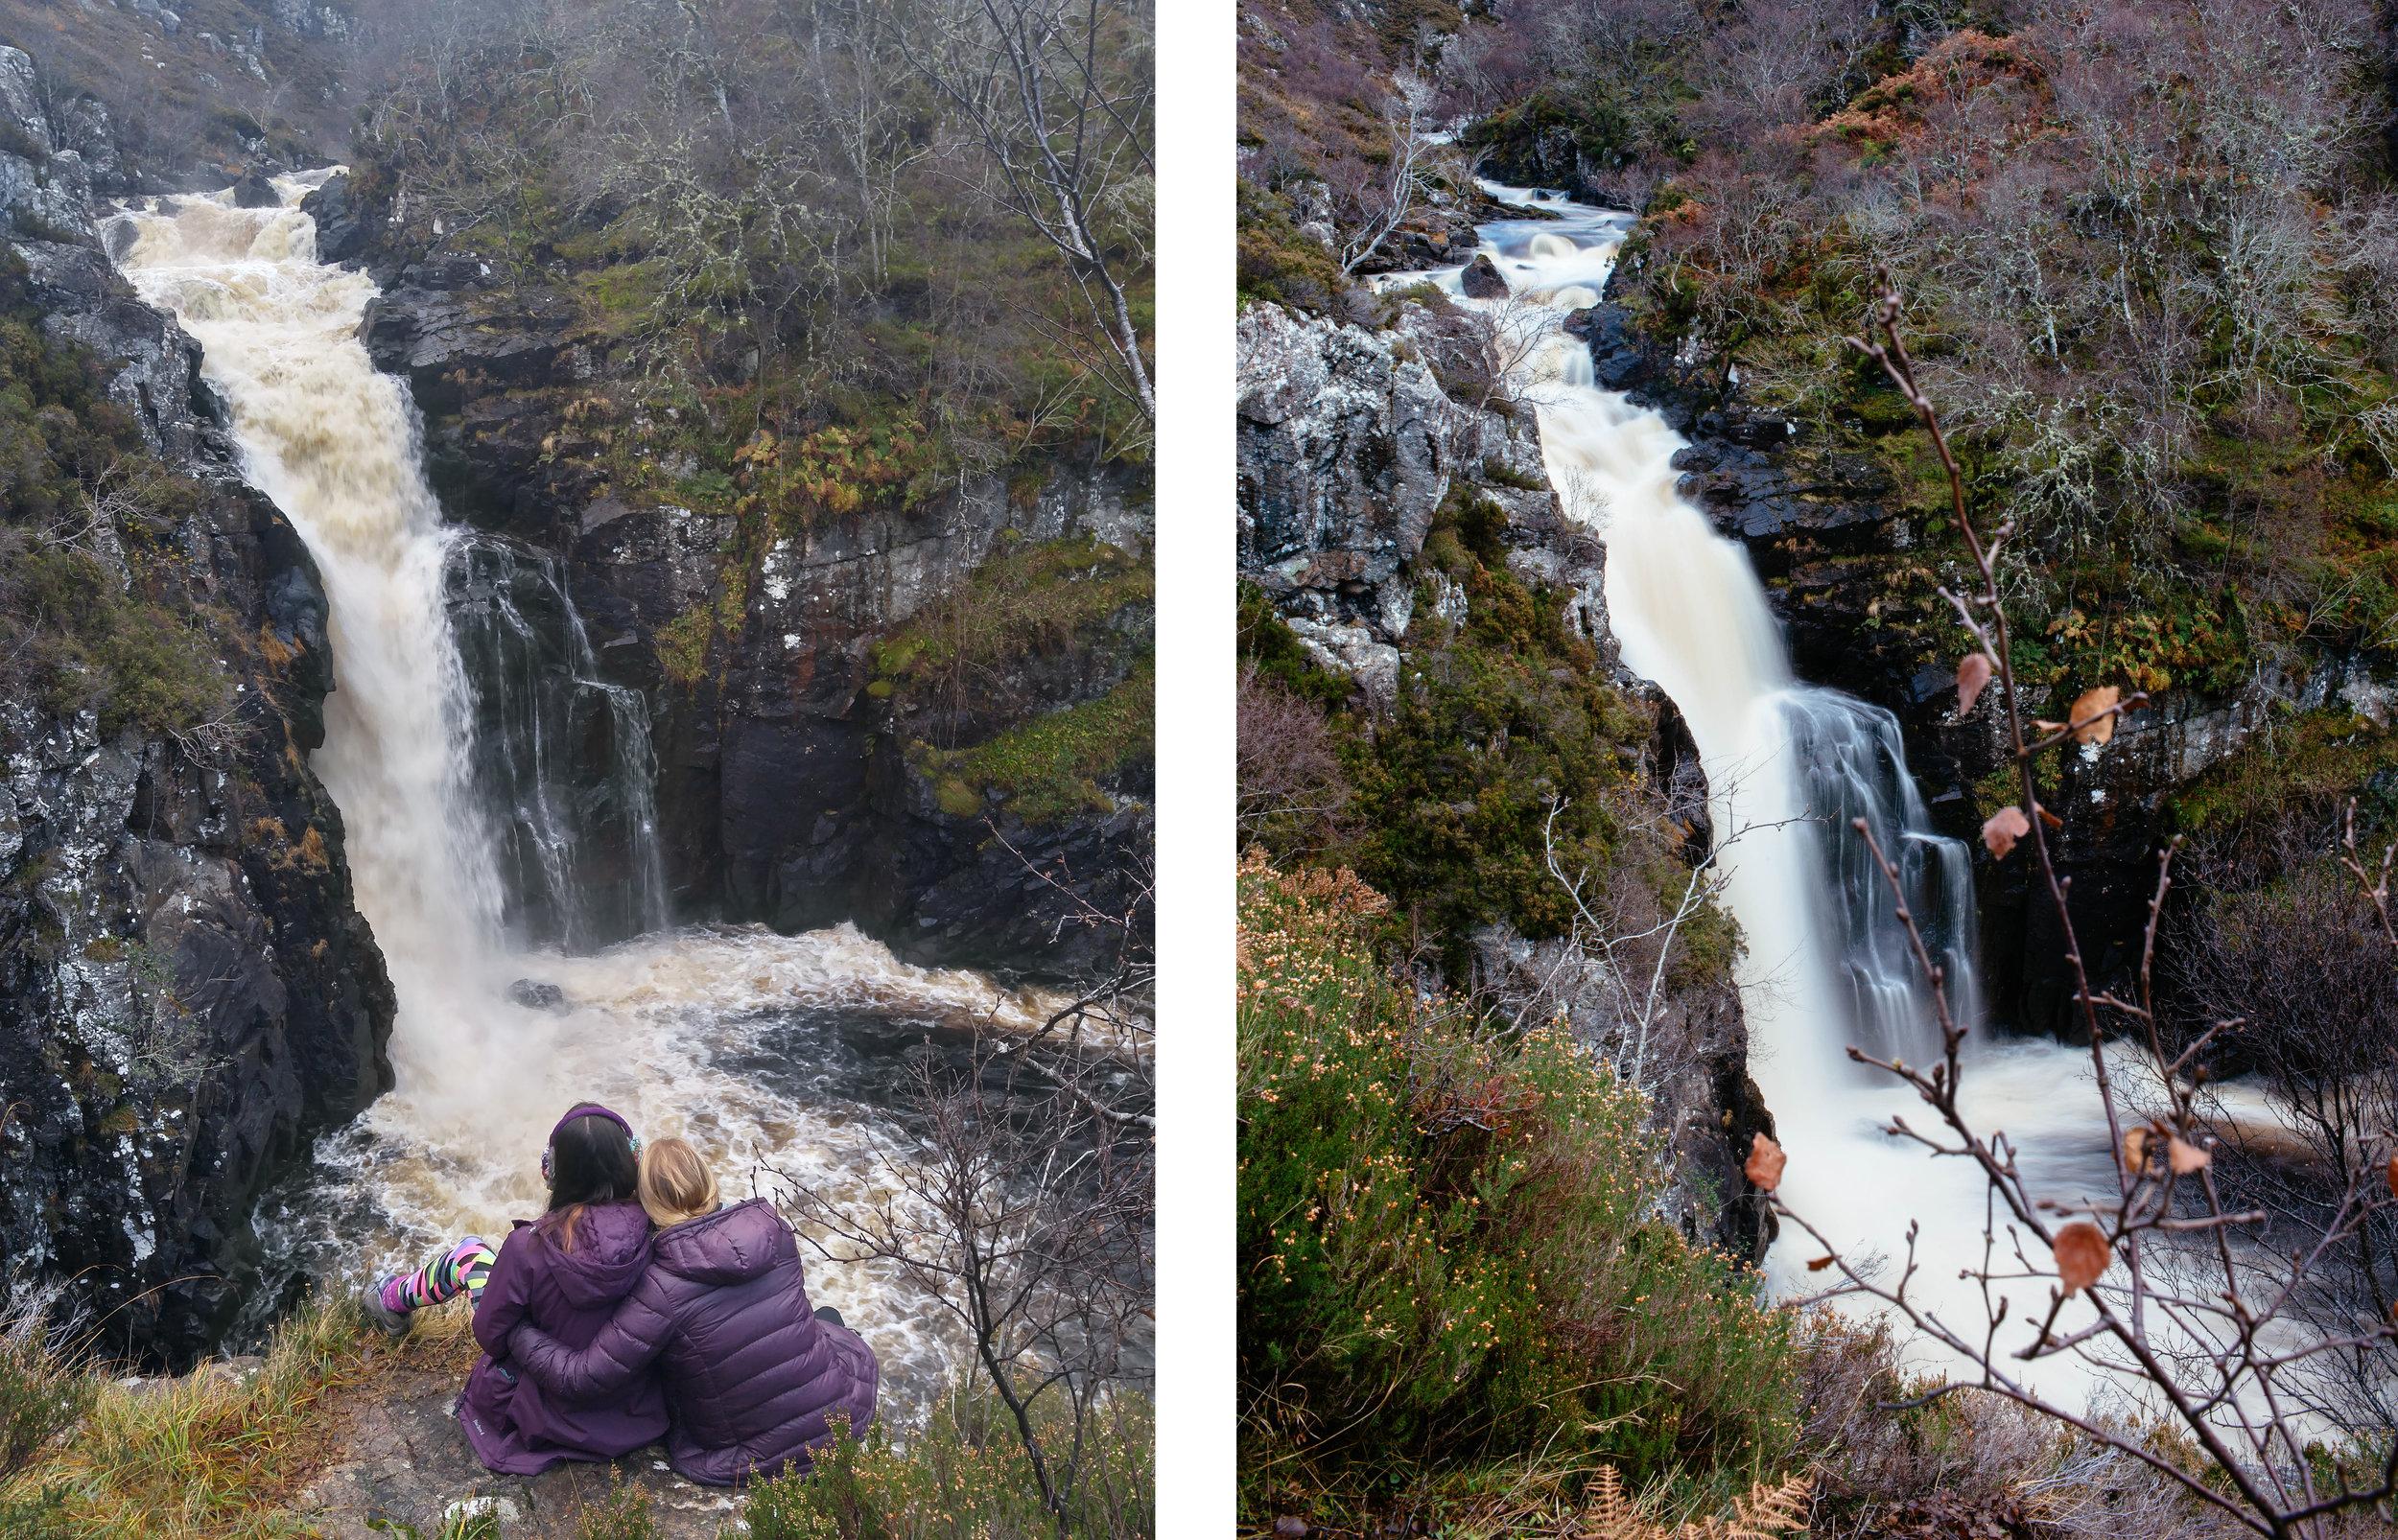 Regular photo (left) / Long exposure (right)